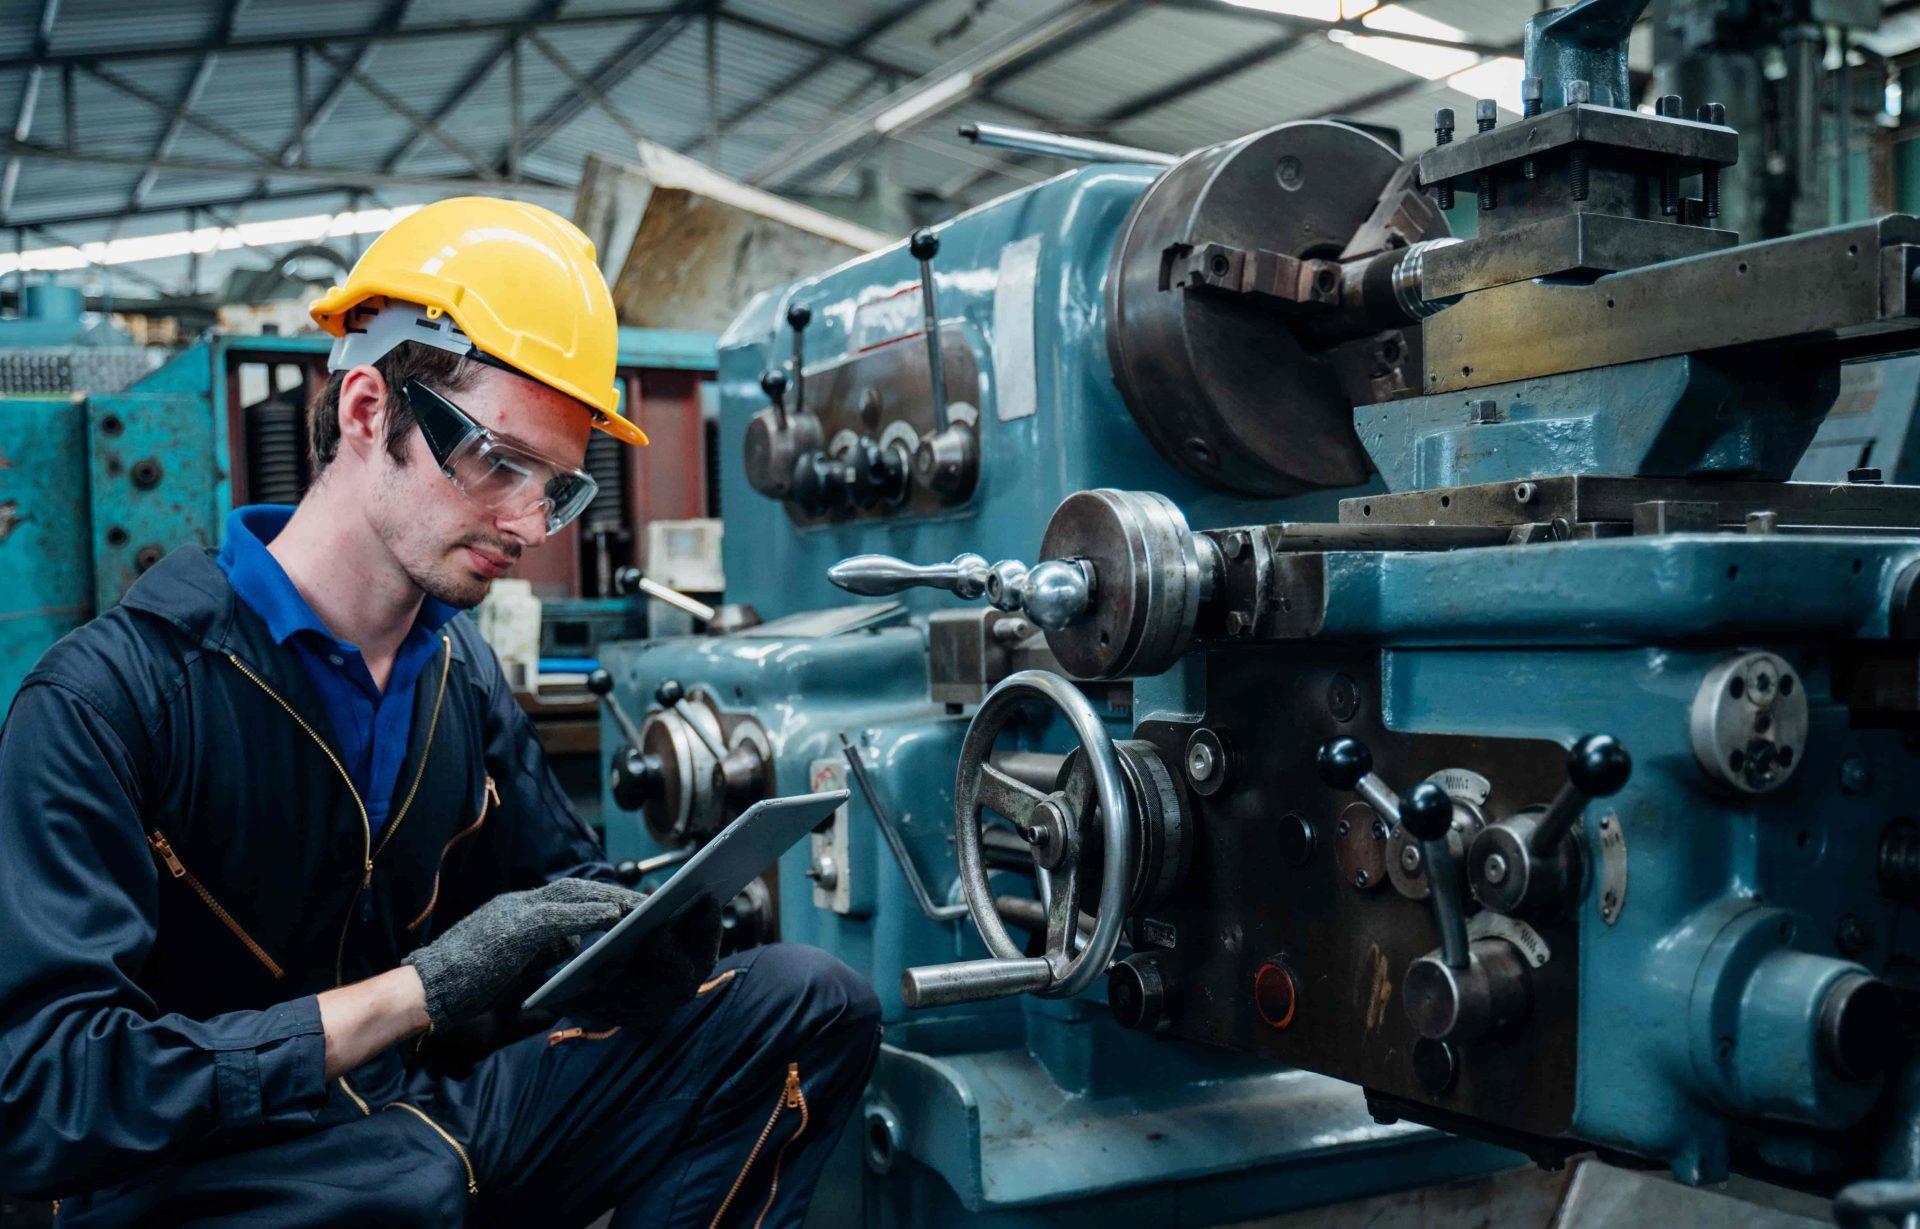 worker performing maintenance at facility